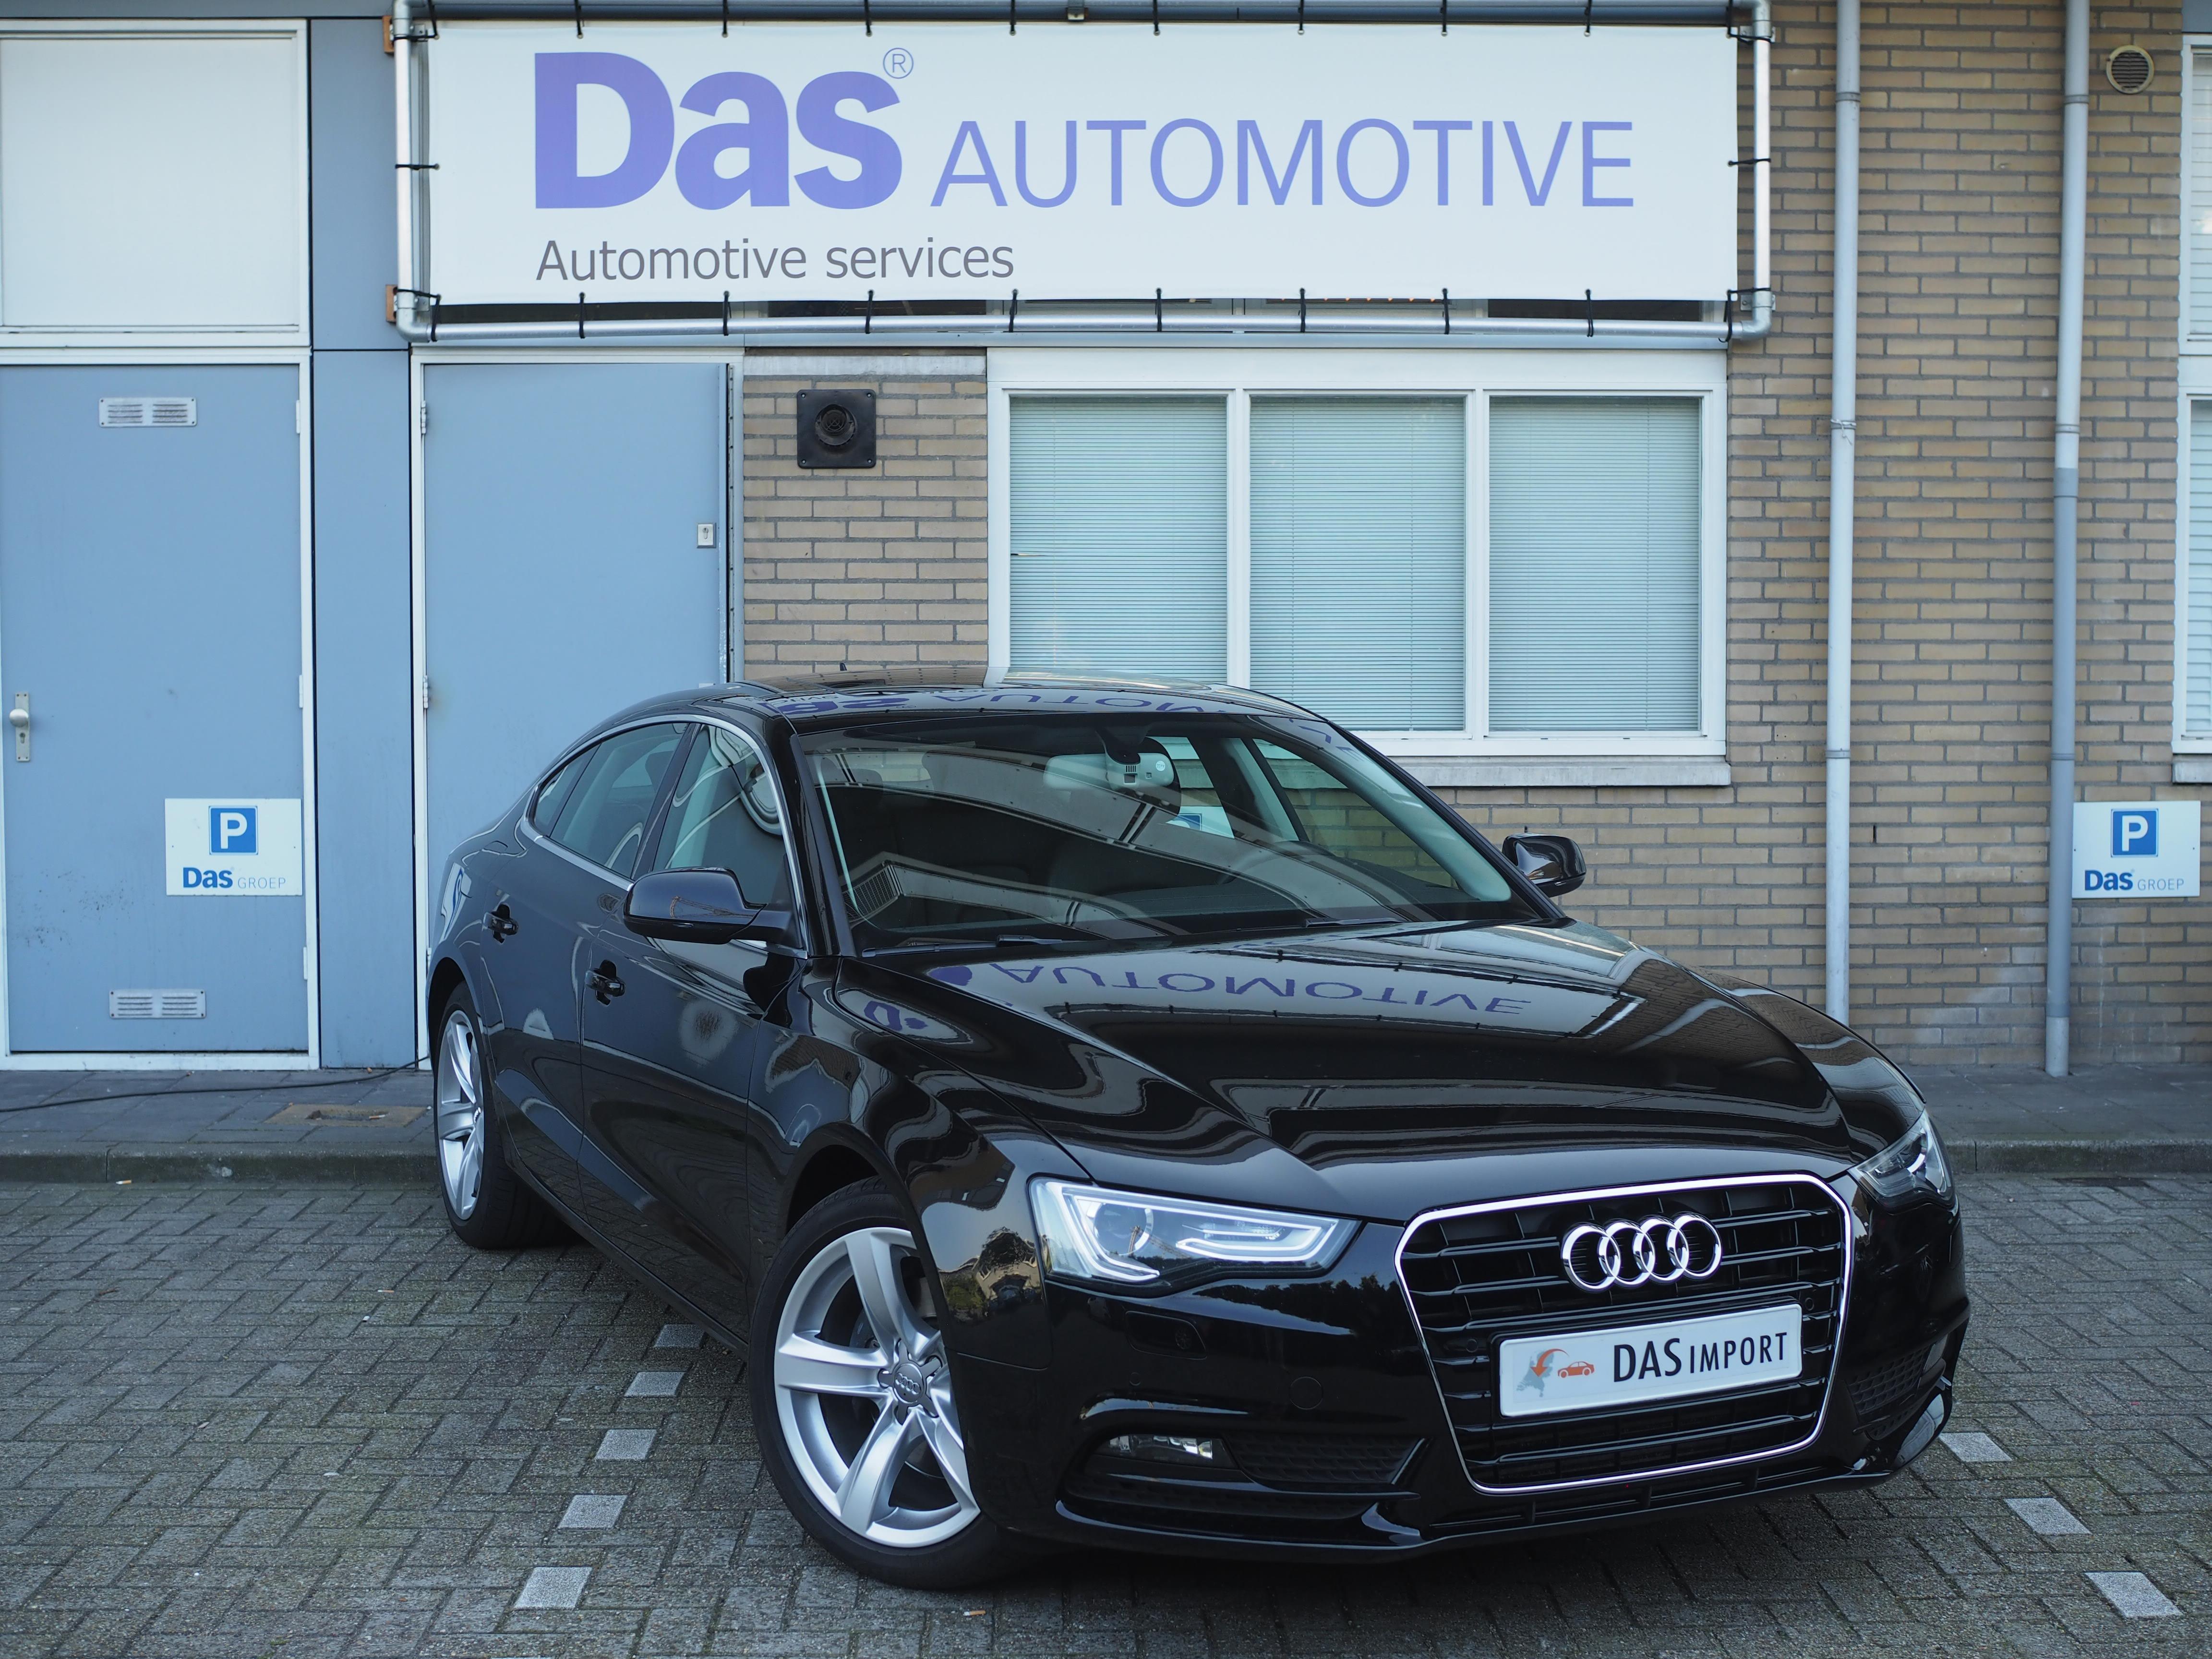 Importauto: Audi A5 Sportback Diesel 3.0 TDI 180kW quattro S tronic 4/2013